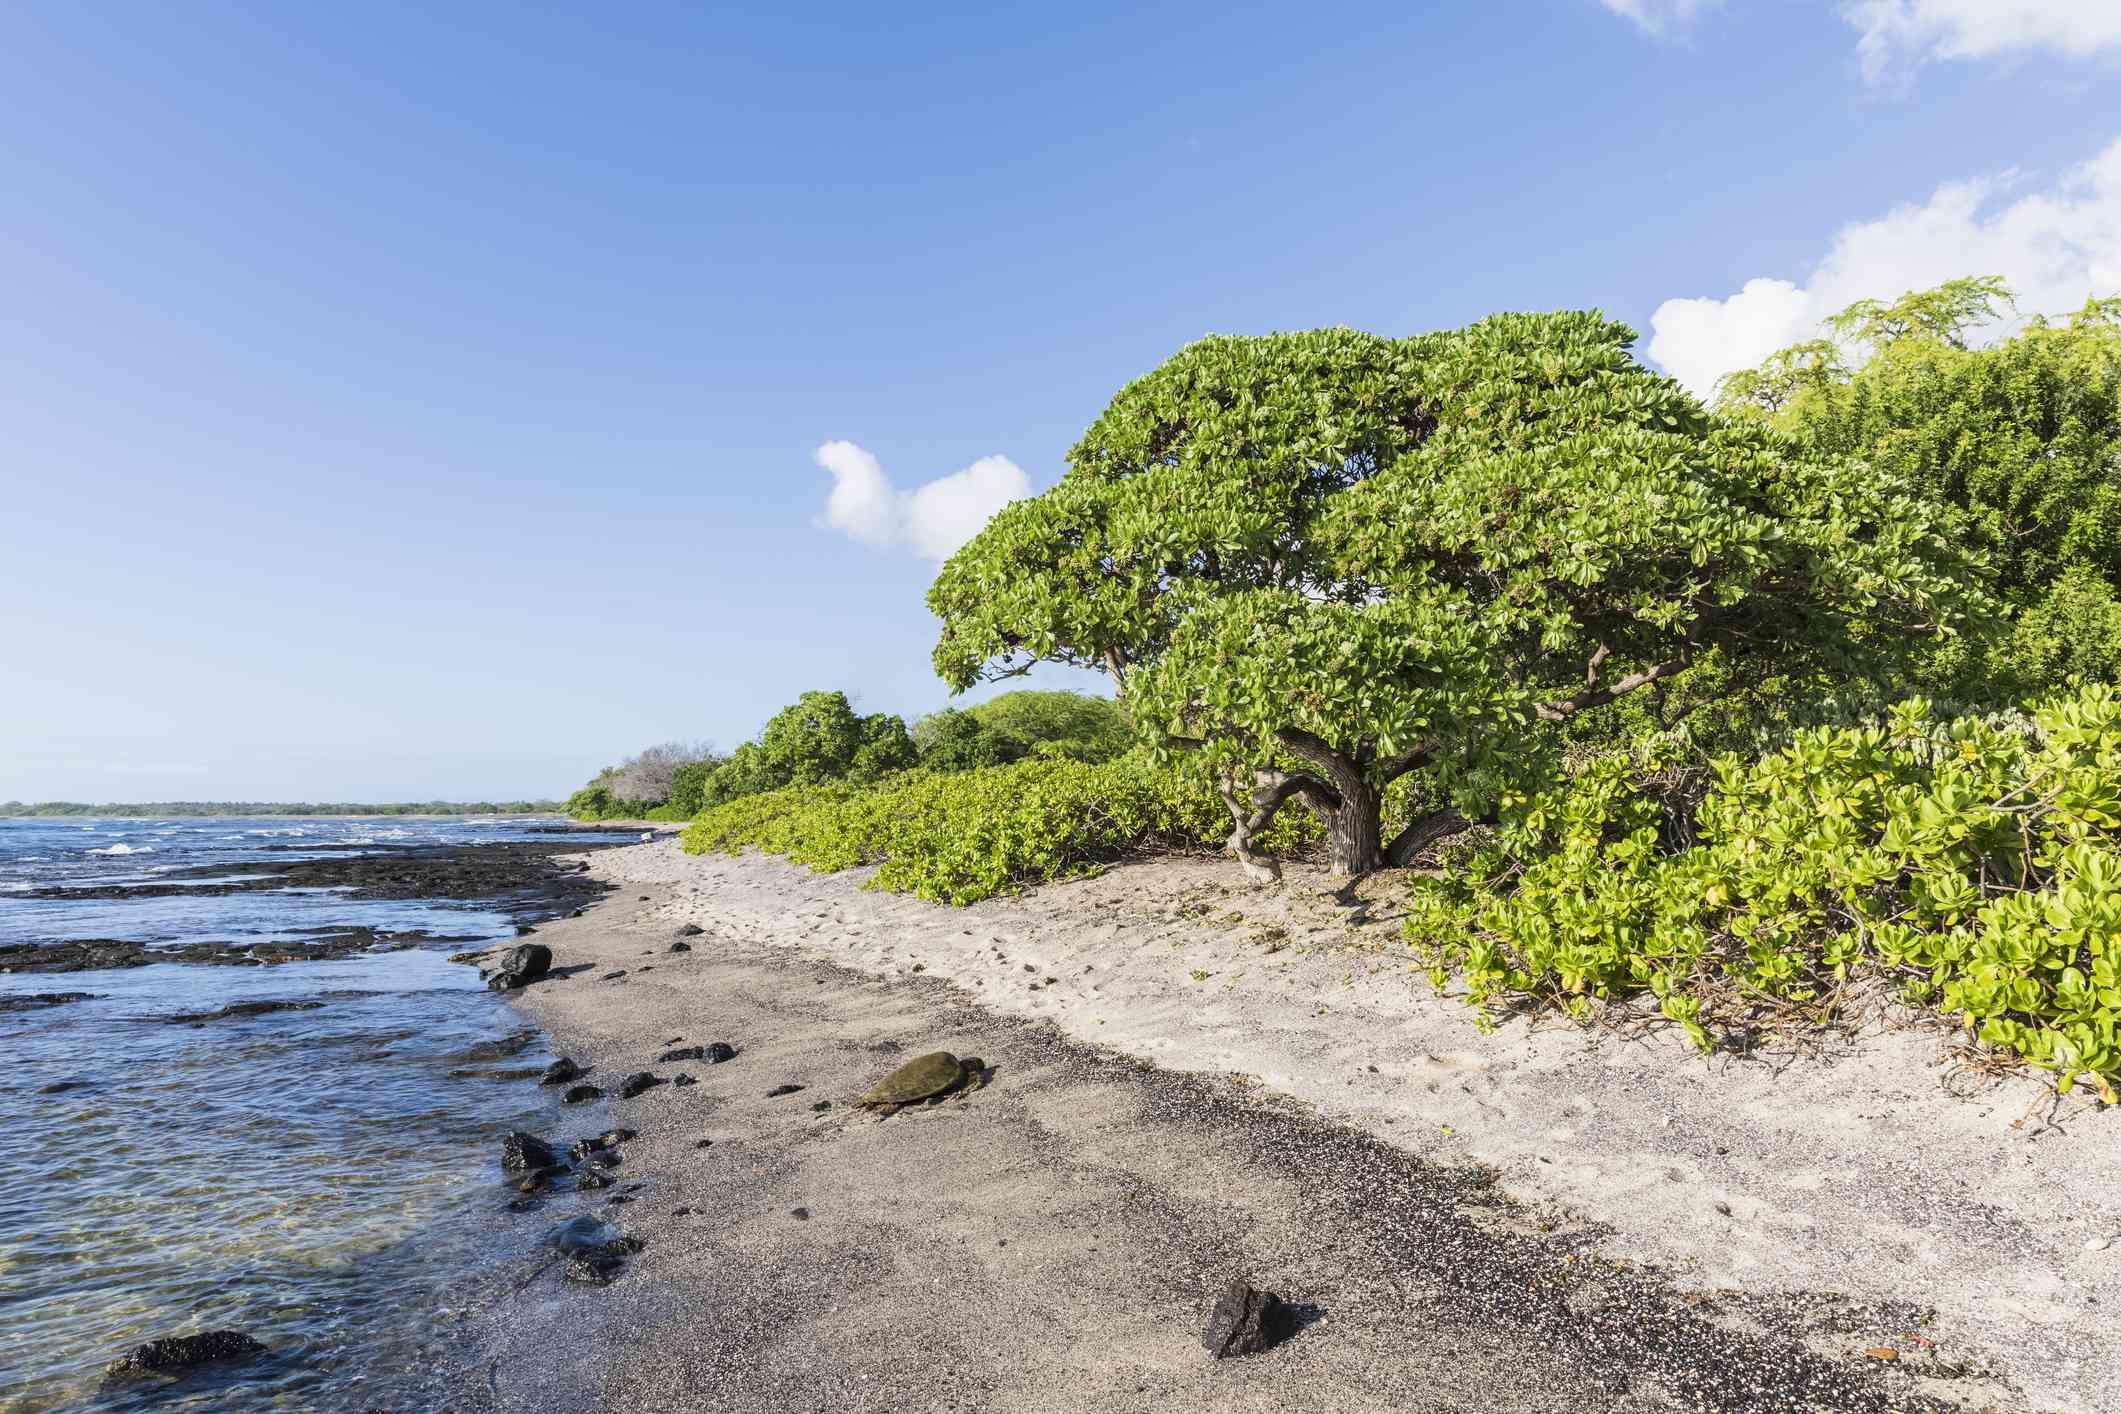 USA, Hawaii, Big Island, Green Sea Turtle on beach at Honokohau Small Boat Harbor